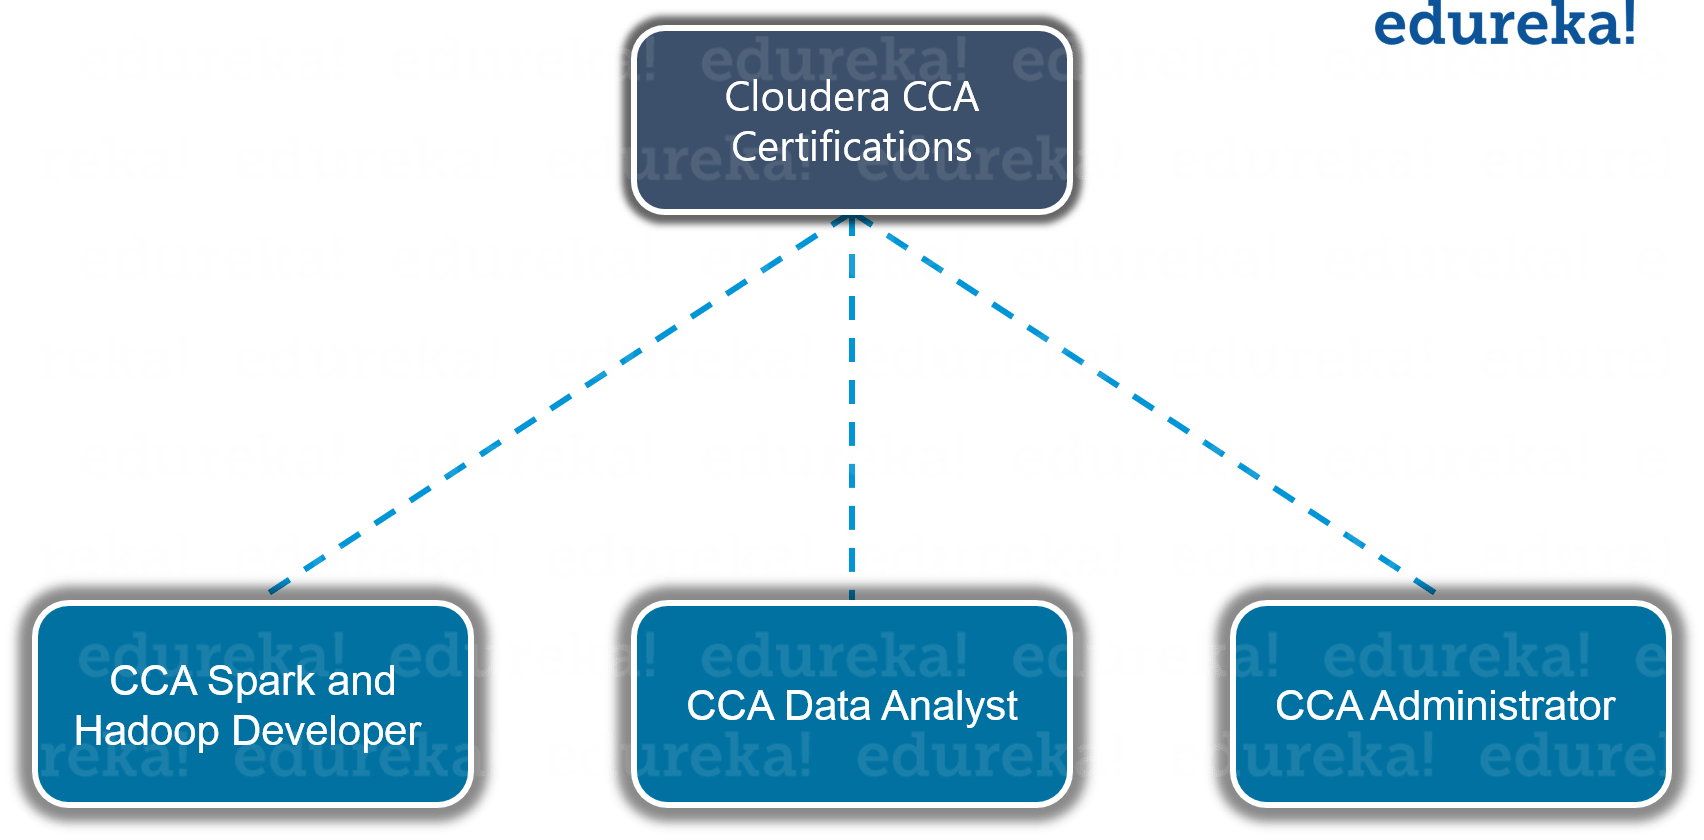 Hadoop Certification | Cloudera, Hortonworks, Edureka Big